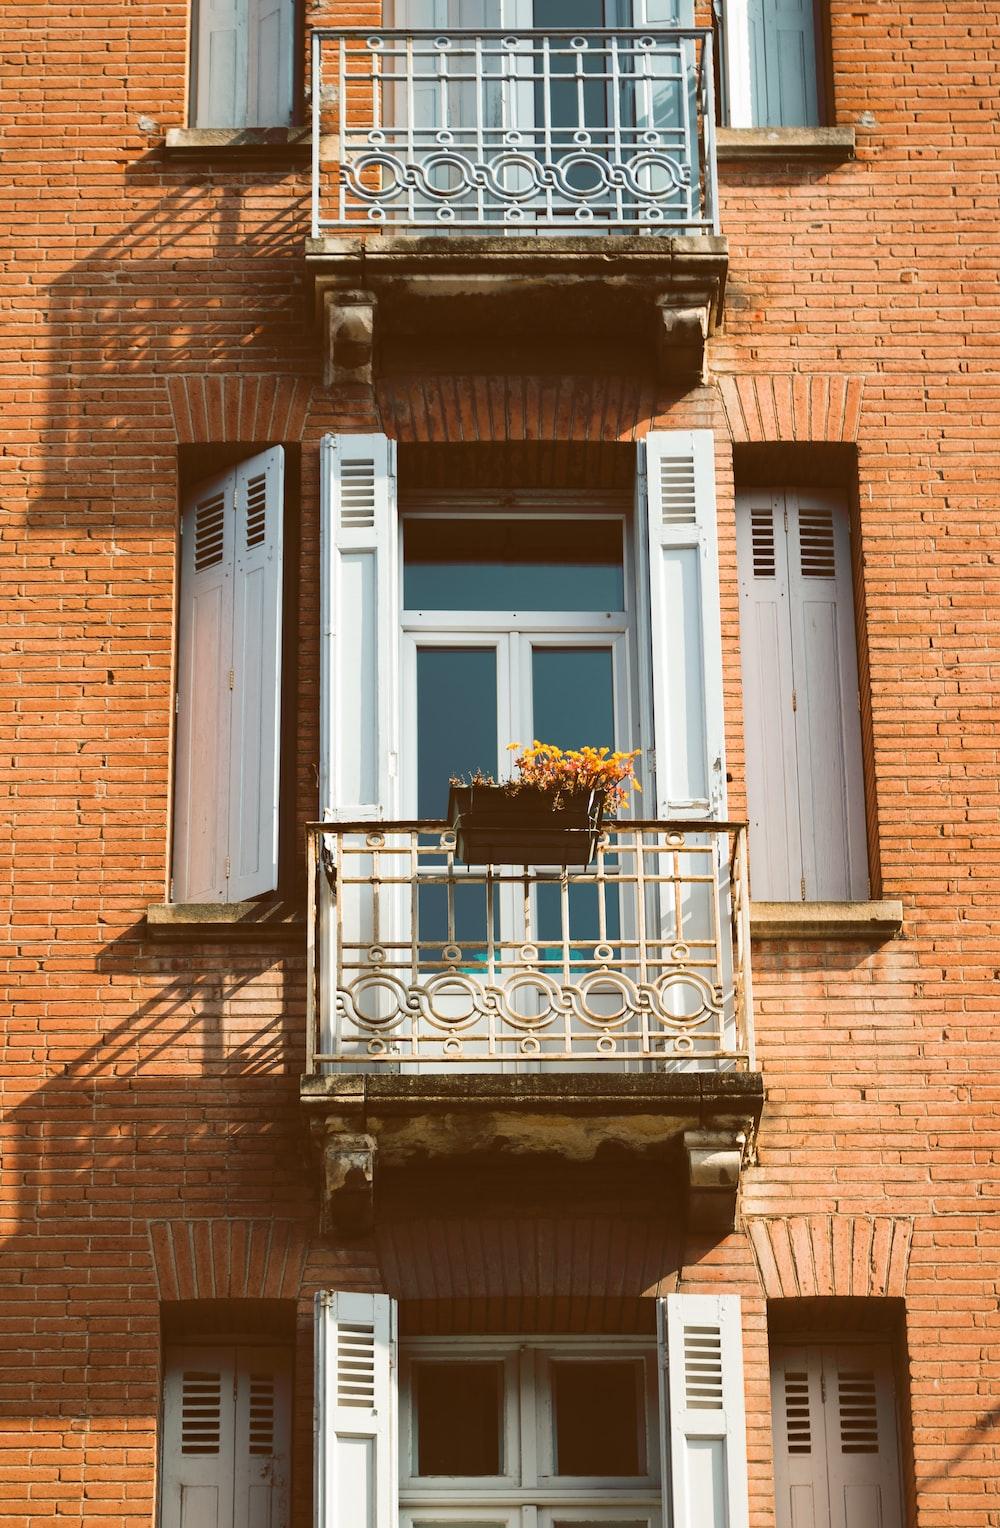 apartment window during daytime